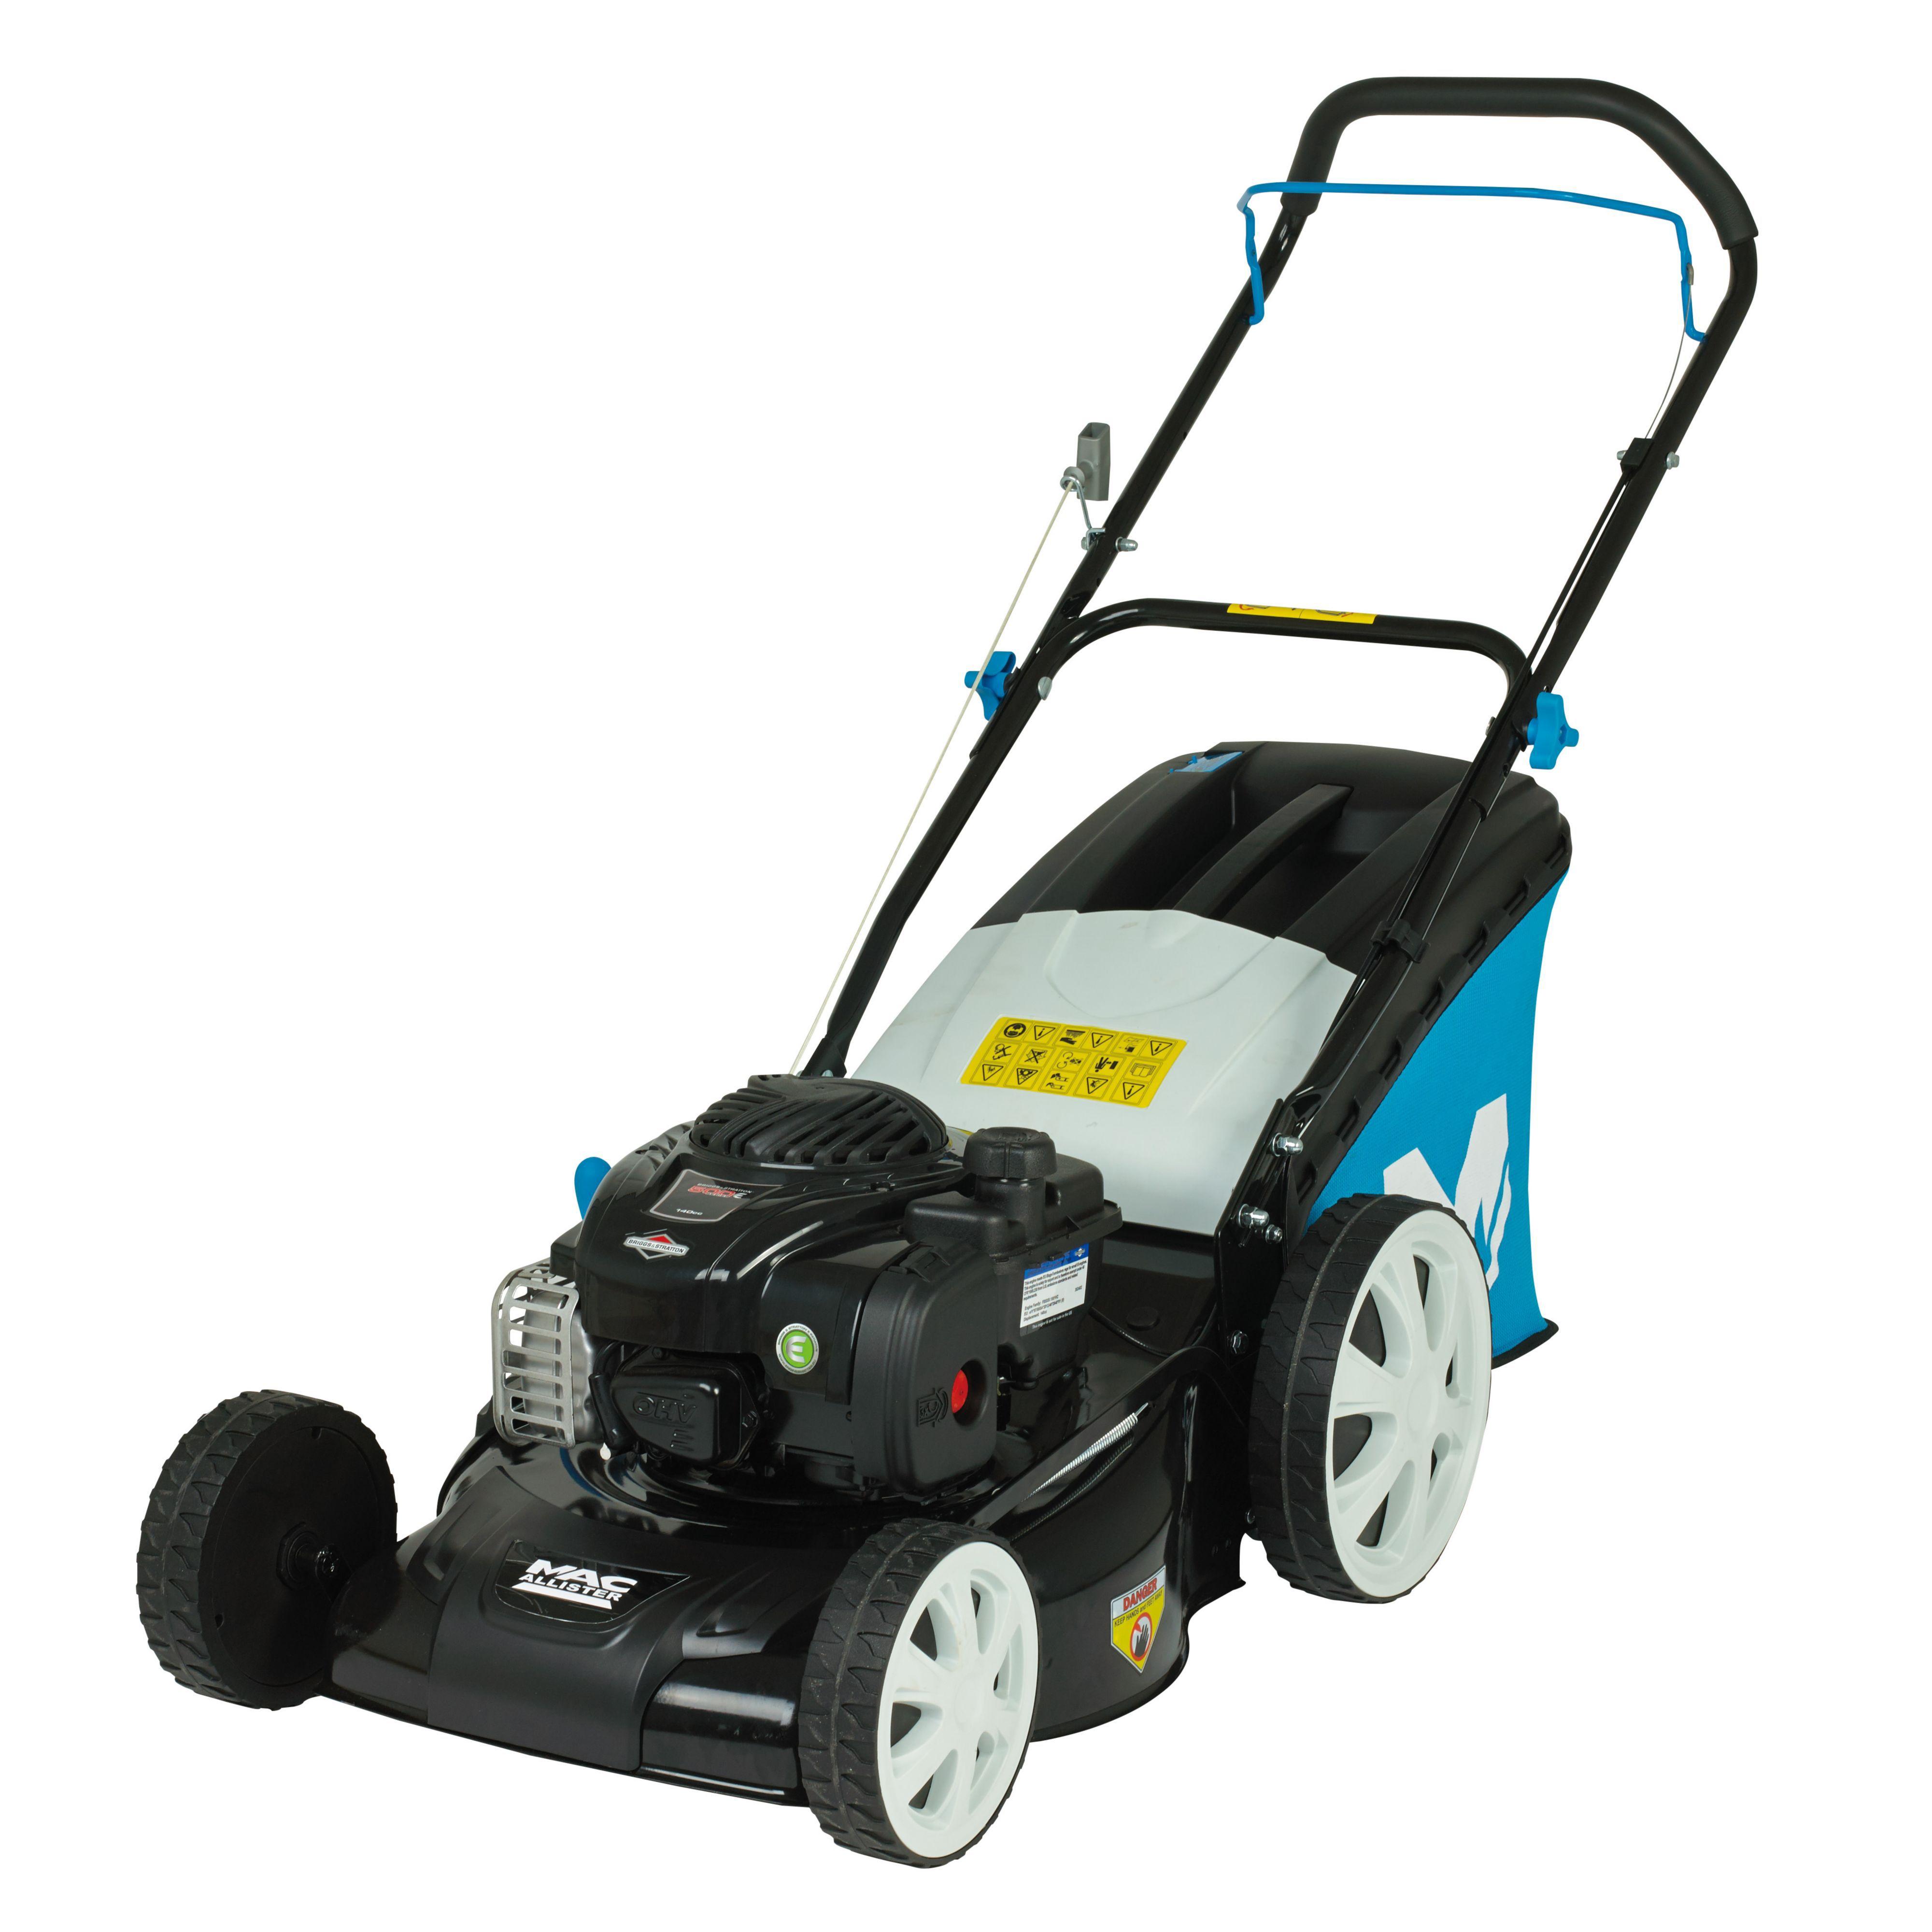 Mac Allister MLMP500HP46 Petrol Lawnmower